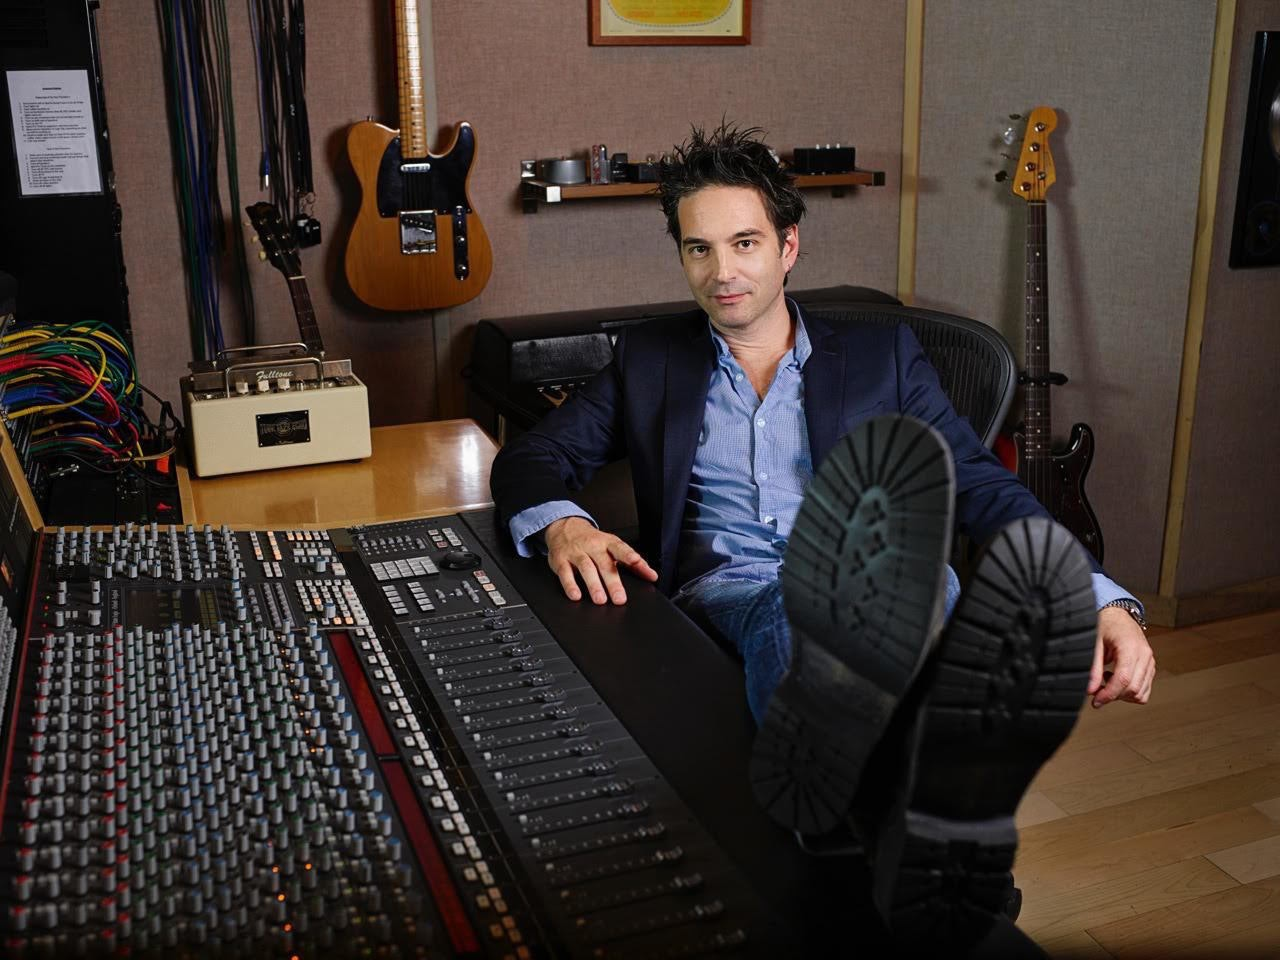 JOB HACKS | Jeff Russo is Composing FX's Mutant Drama 'Legion'